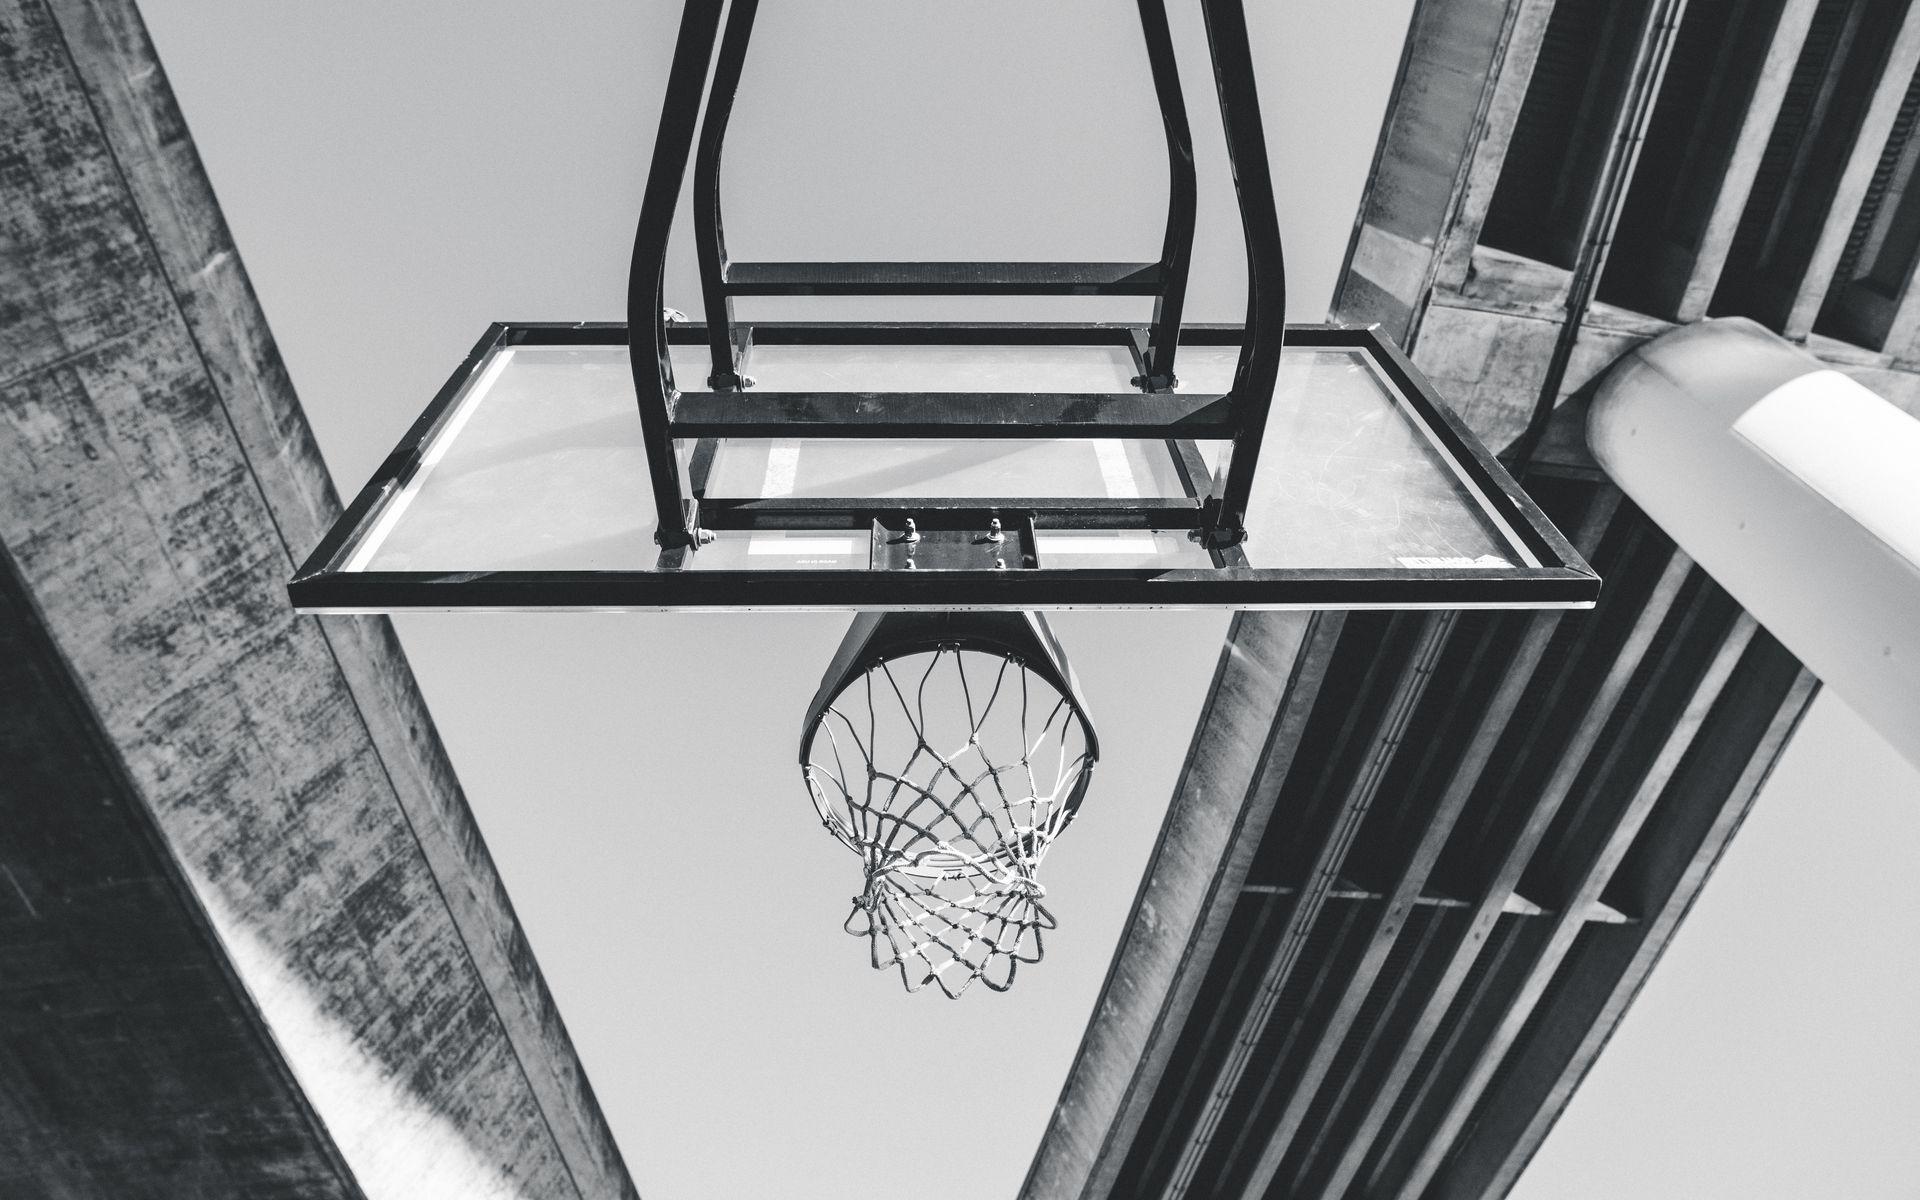 1920x1200 Wallpaper basketball, ring, mesh, bw